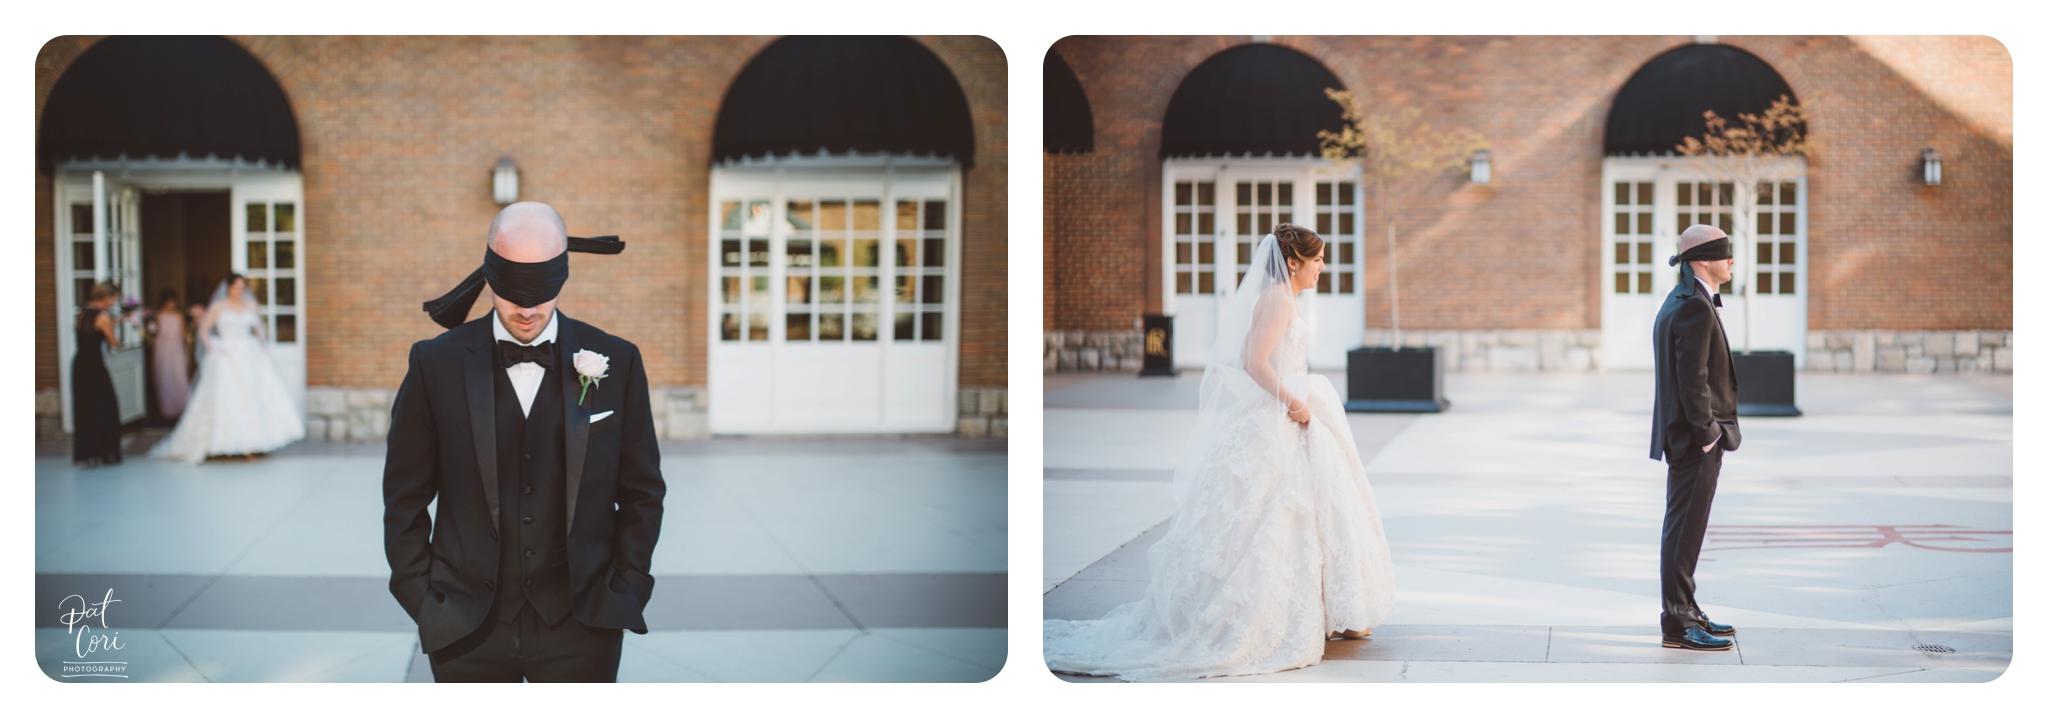 Center-in-the-Square-_-Weddings-Wedding-Photographer-Virginia-016.jpg